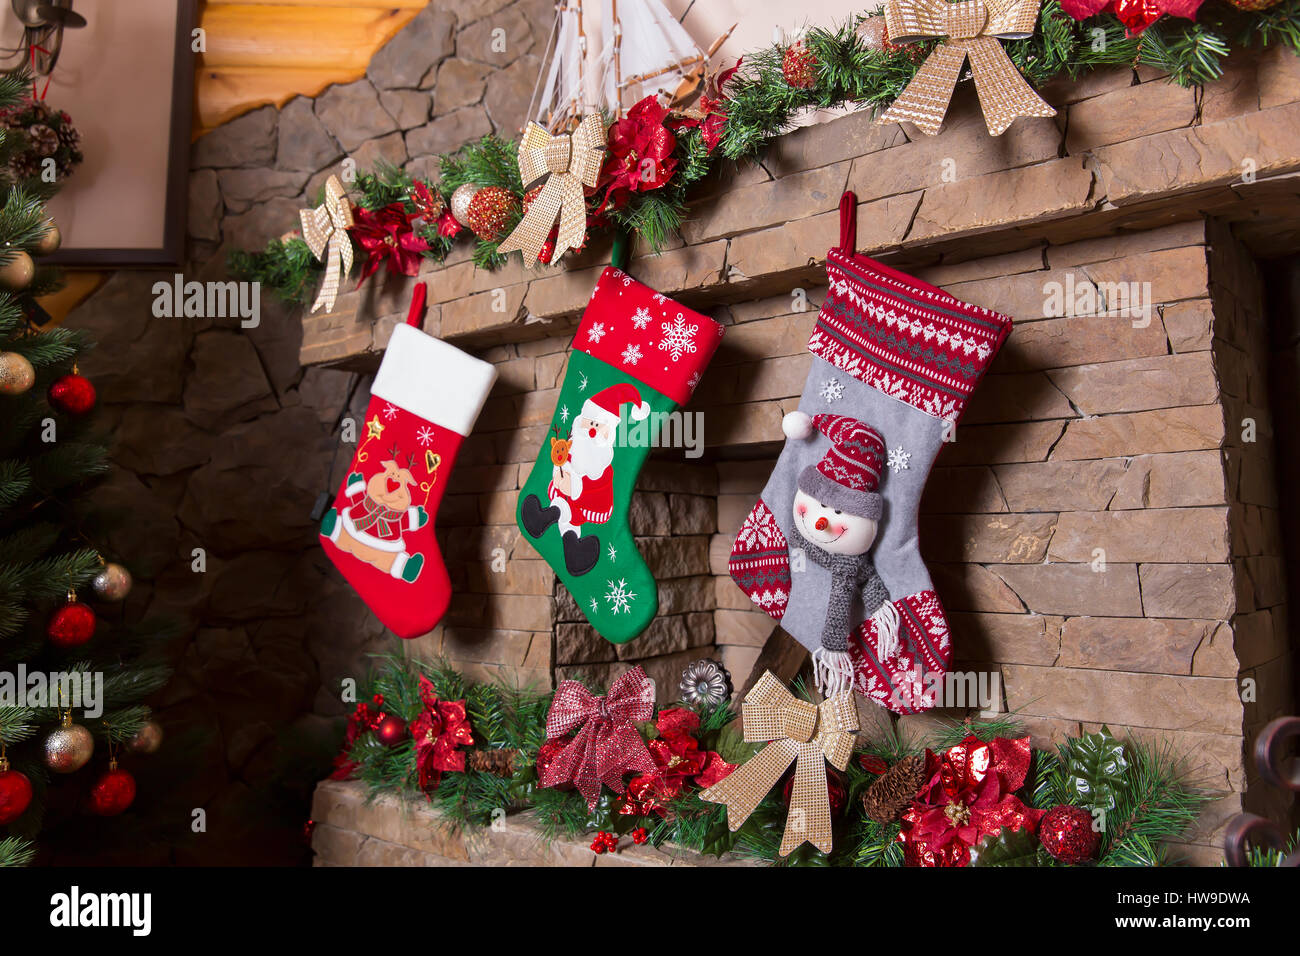 Stone Fireplace Decorated With Christmas Stockings Xmas